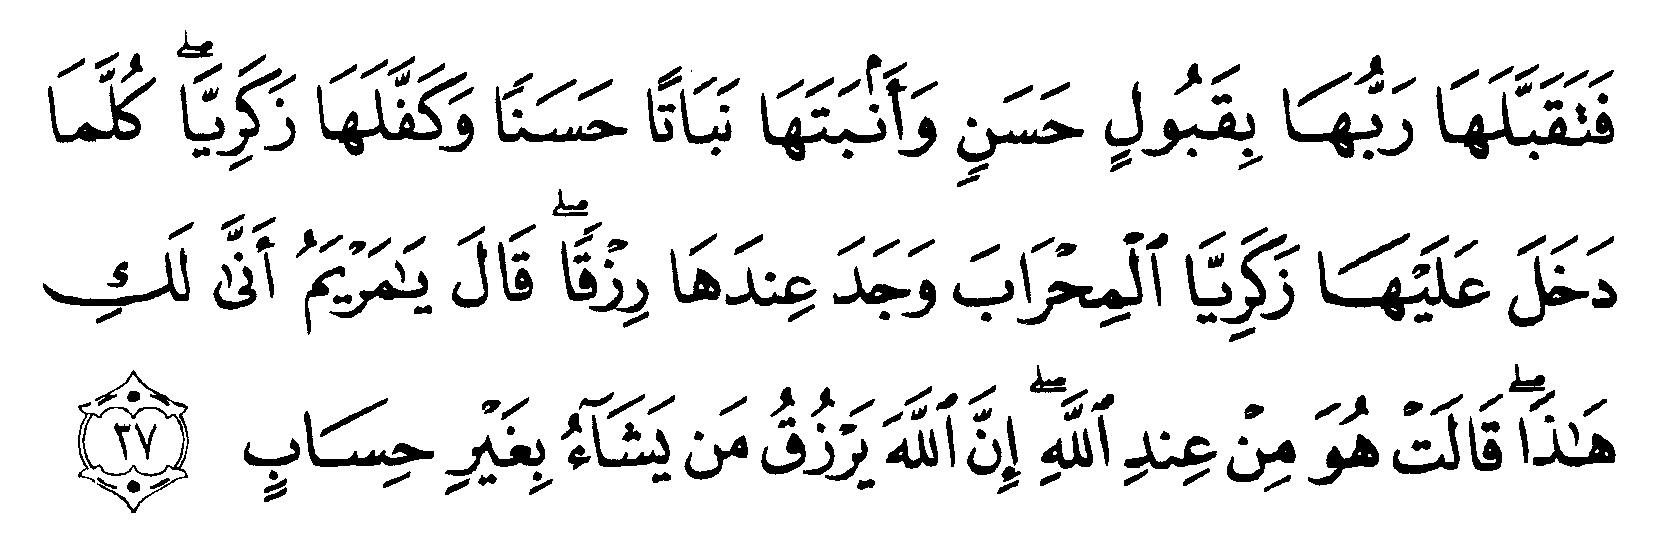 Tafsir Ibnu Katsir Surah Ali Imraan Ayat 37 Alquranmulia